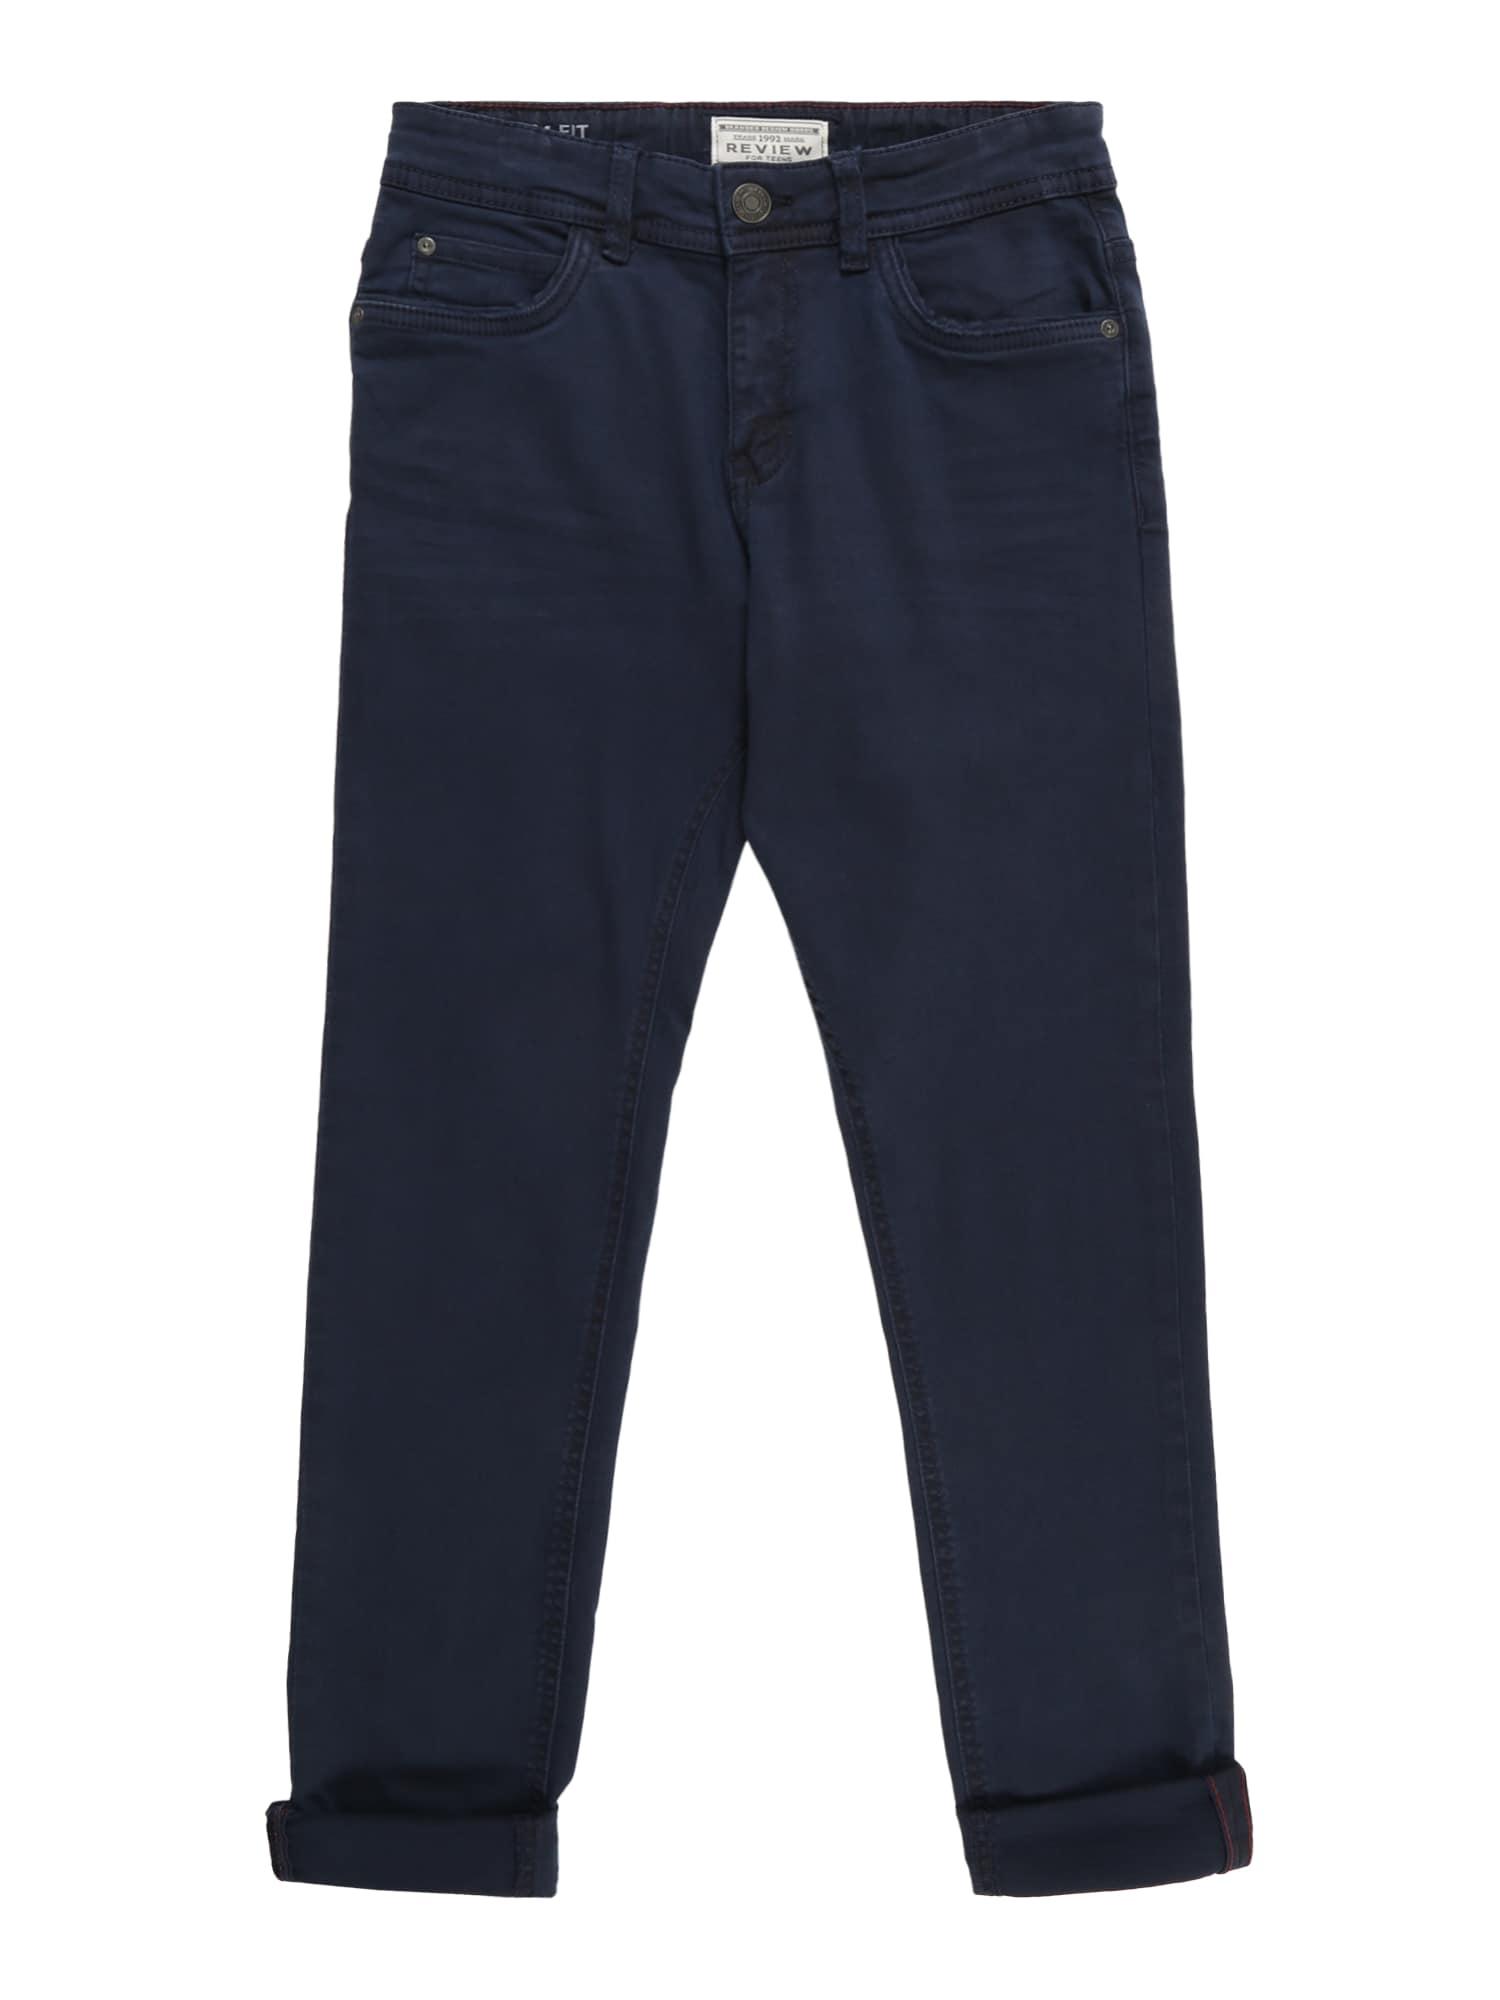 Kalhoty tmavě modrá REVIEW FOR TEENS